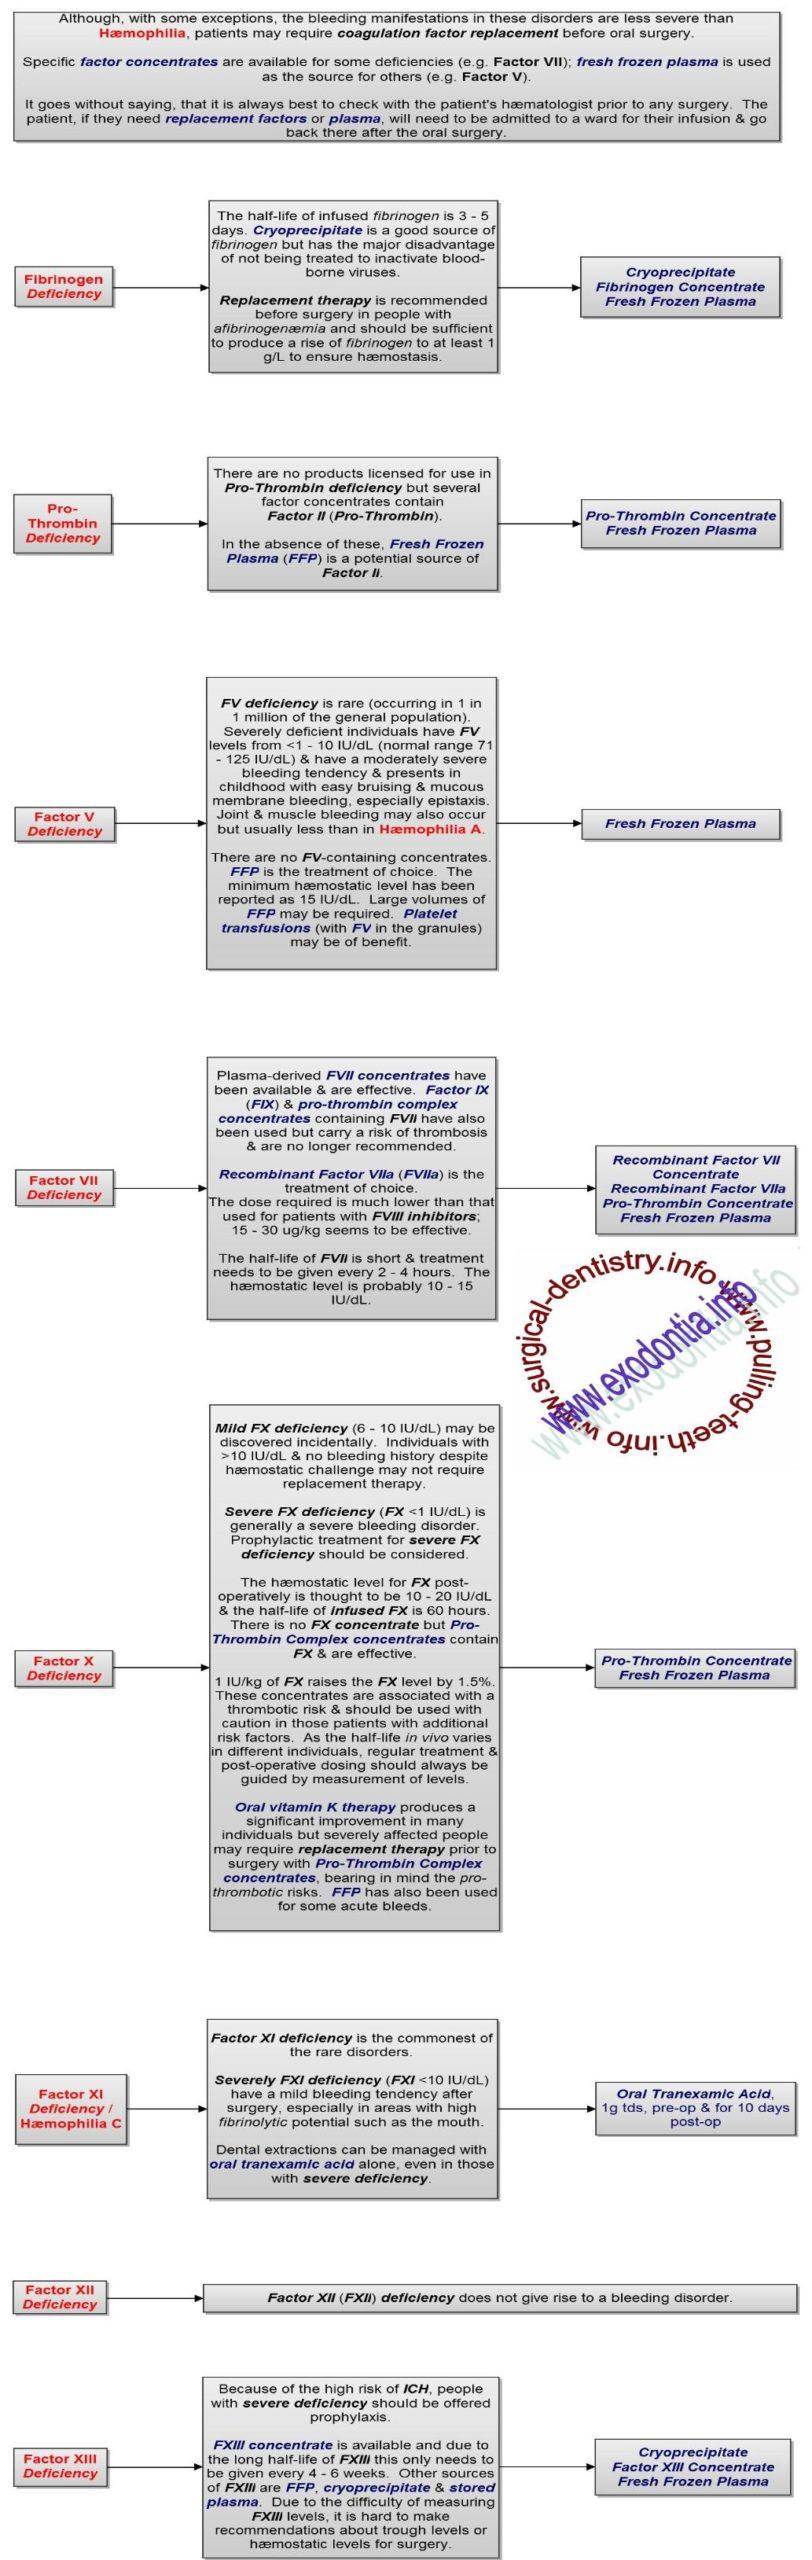 Rare_Coagulation_Factor_Deficiency_2-1033x3256